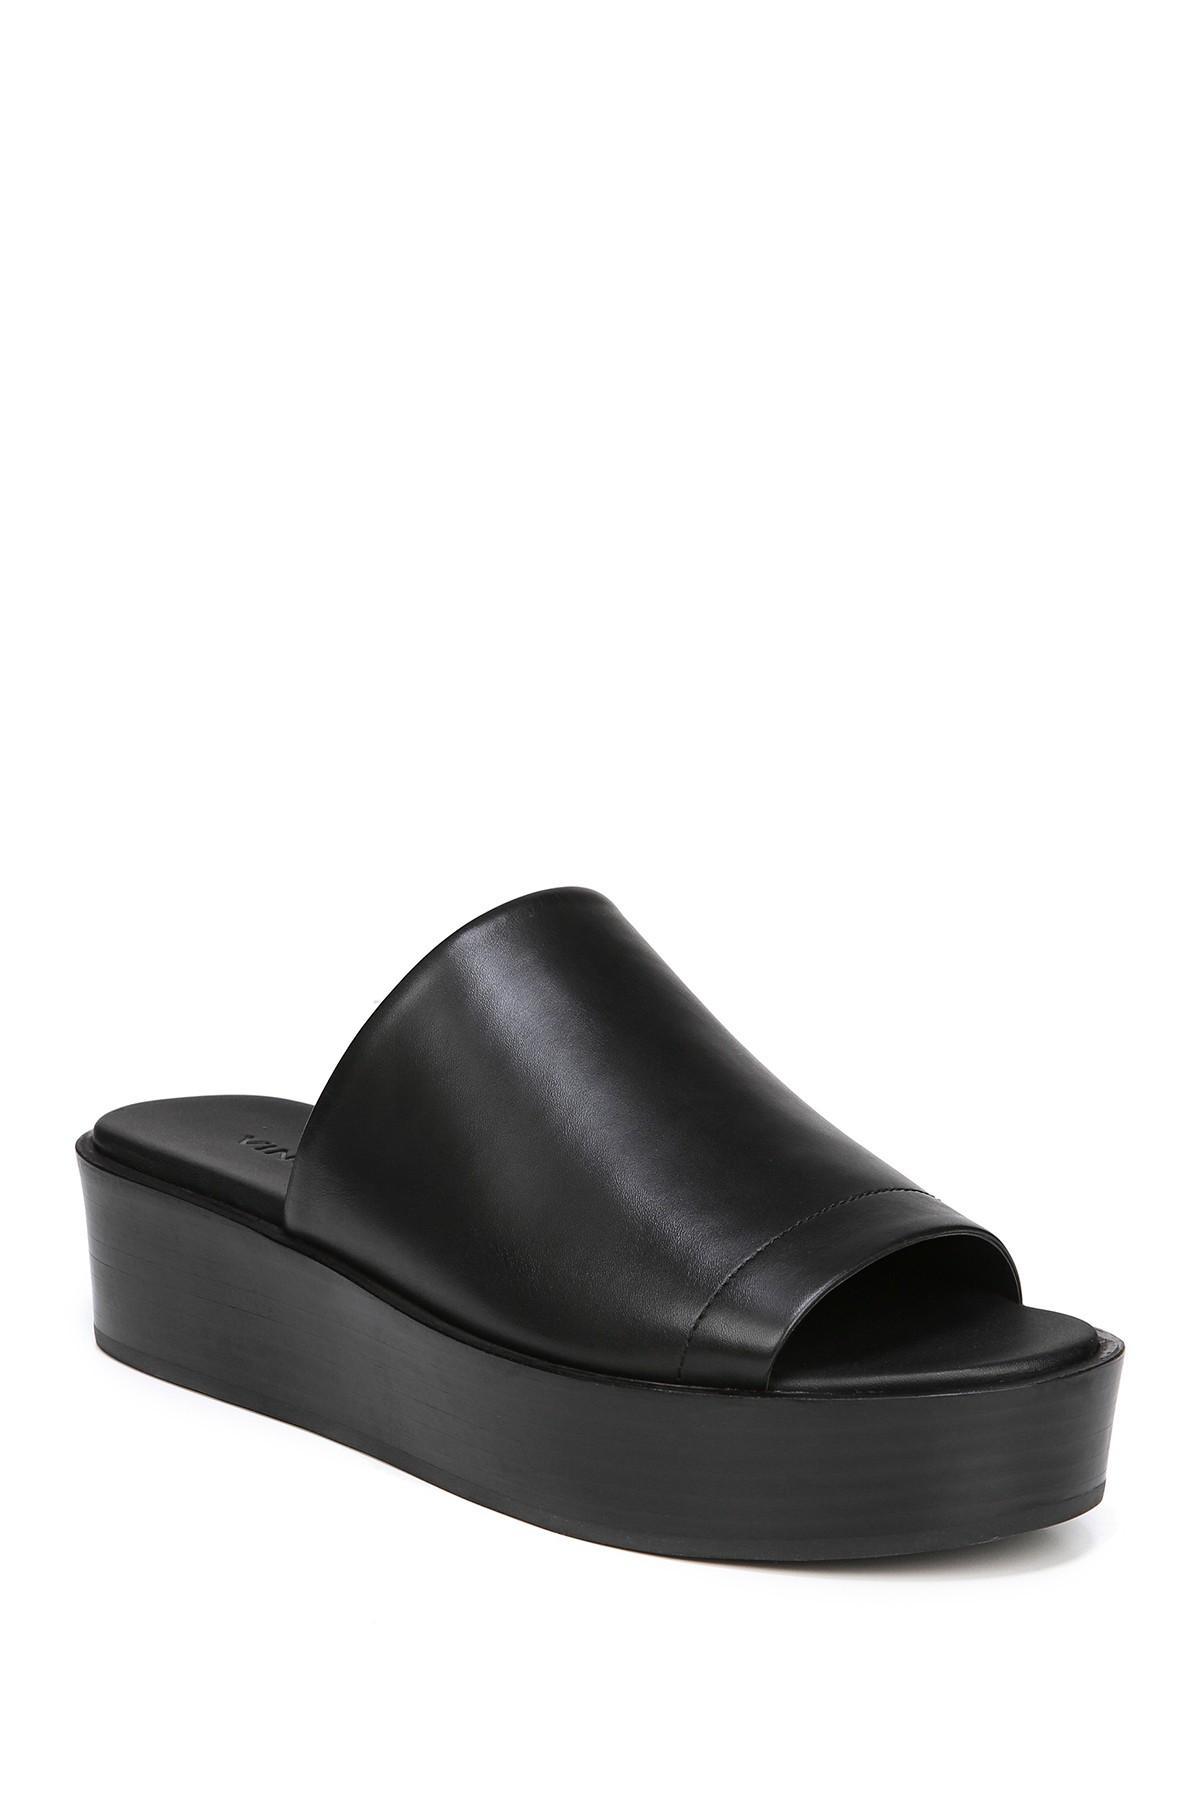 7a80334d2b6 Lyst - Vince Saskia Leather Platform Sandal in Black